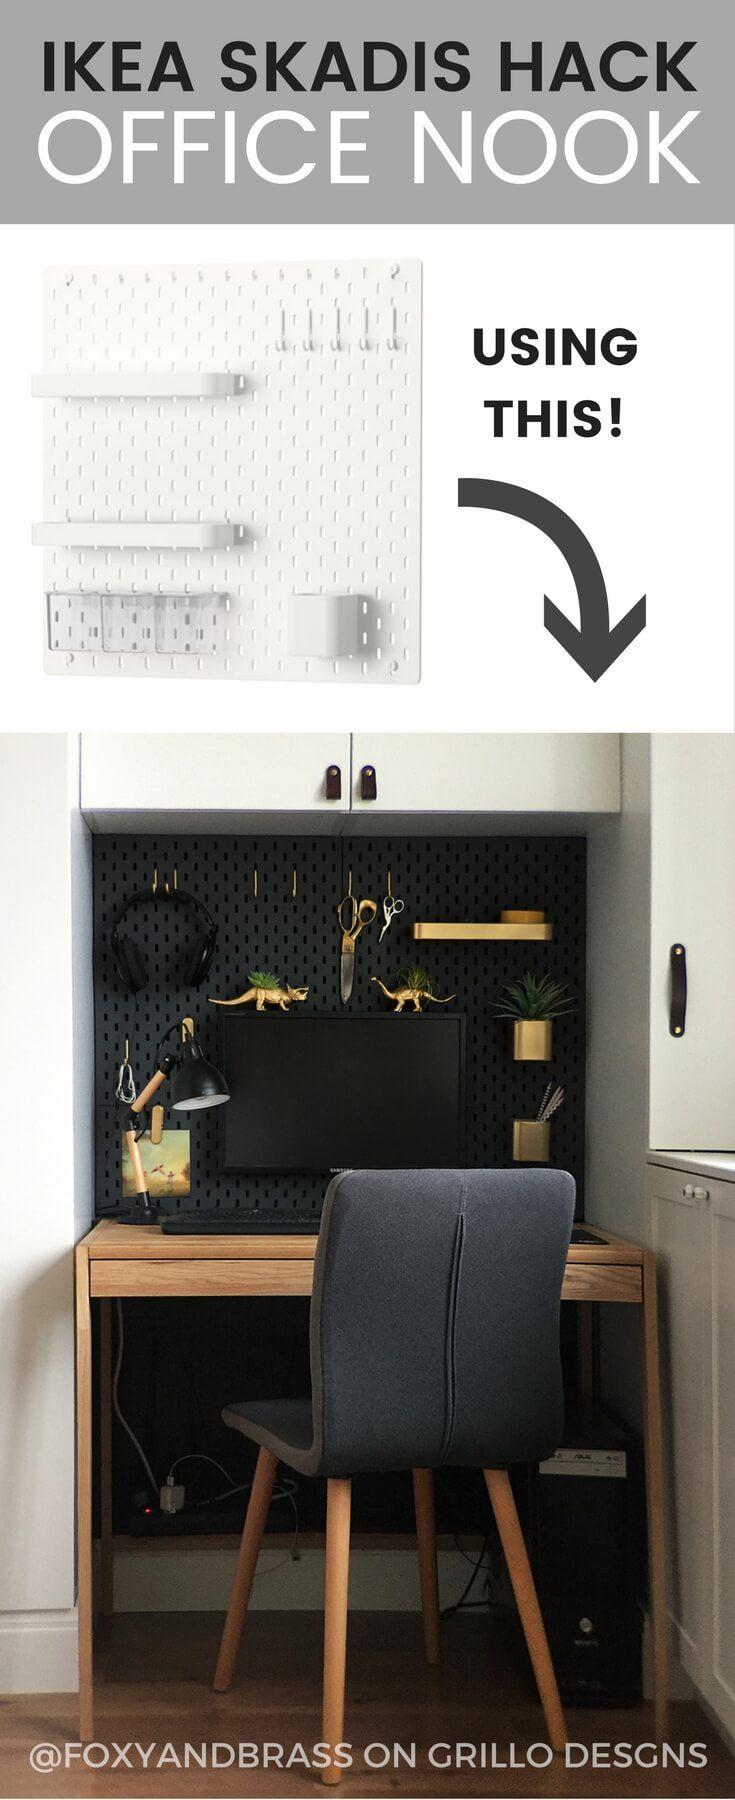 Photo of IKEA SKADIS HACK – For A Mini Office Nook